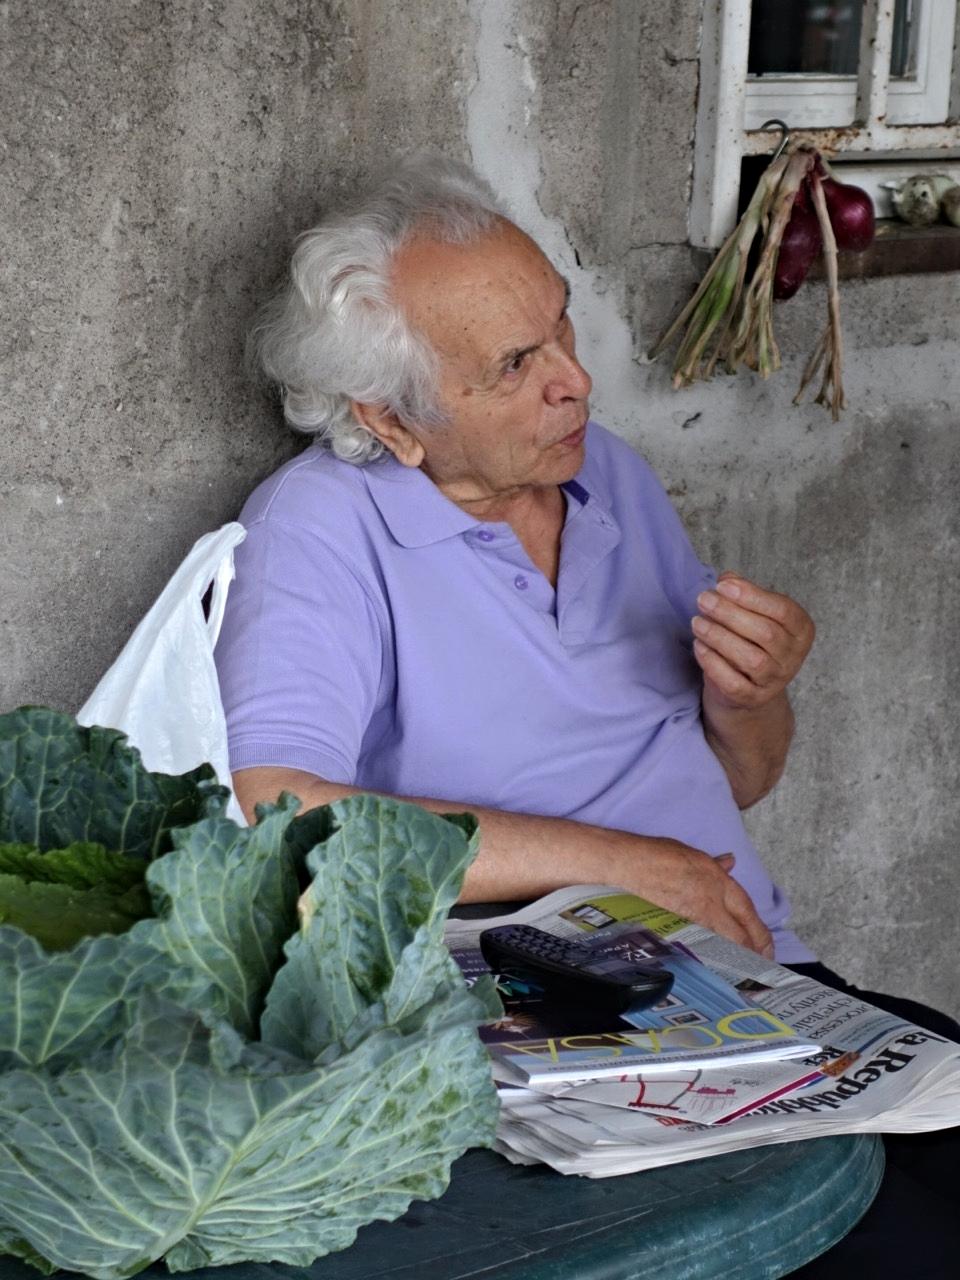 Zio Pinuccio Explains (Scafati, Italy)